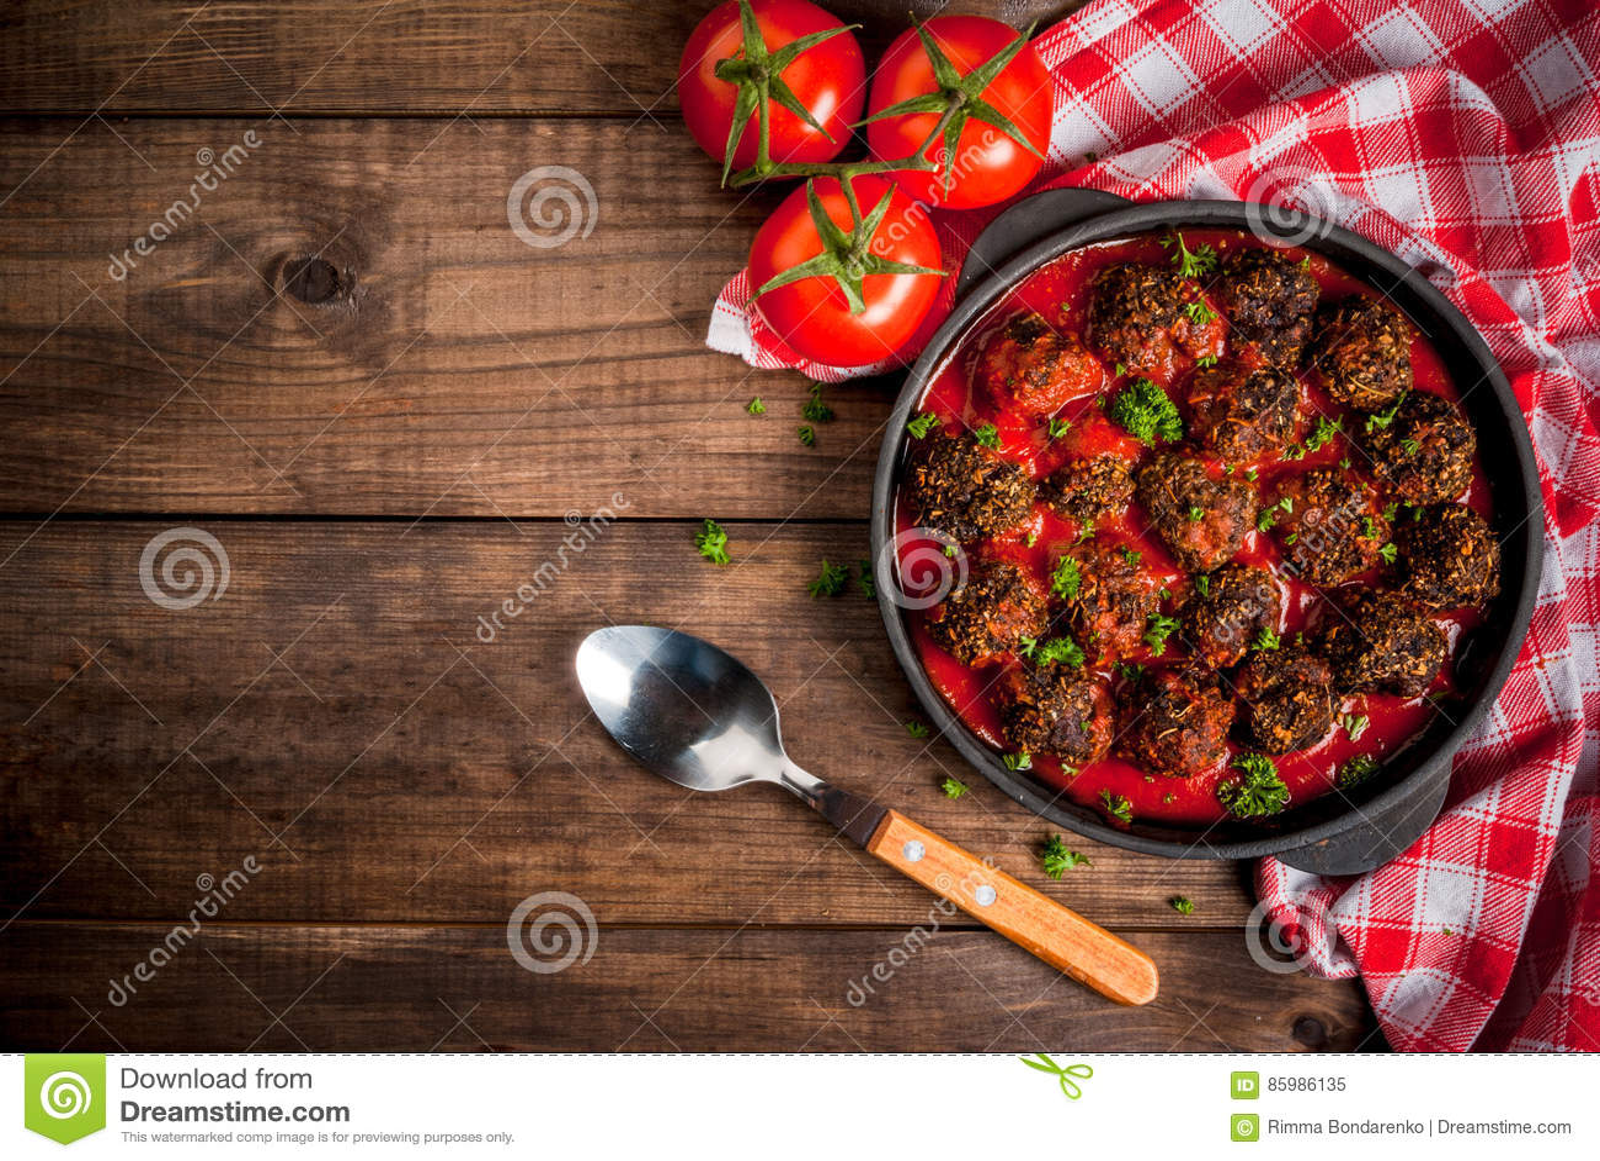 Almôndegas trituradas caseiros da carne